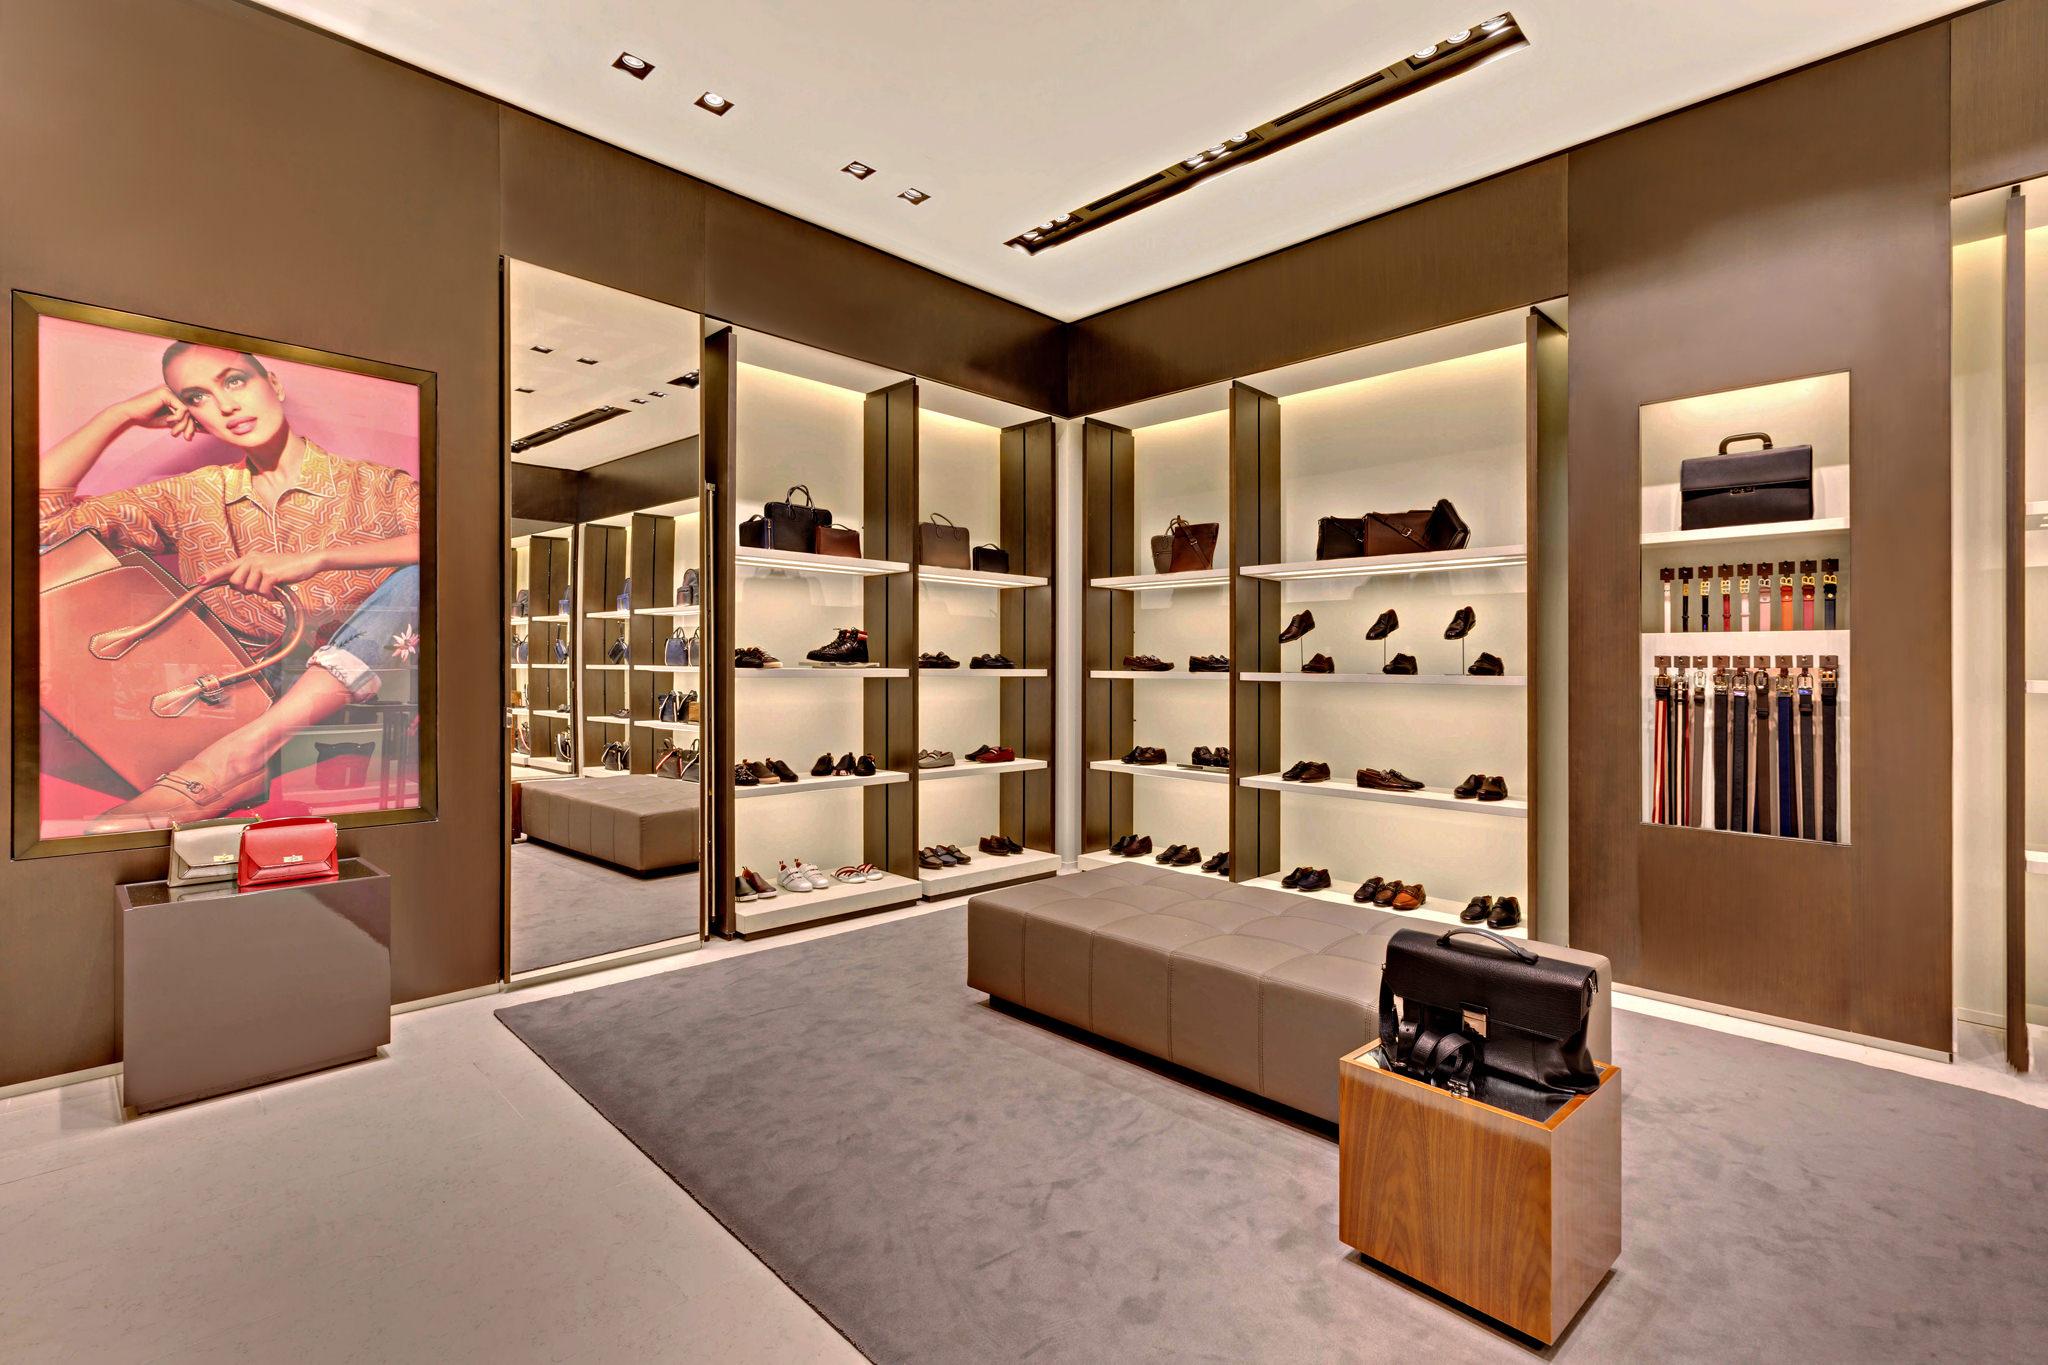 20170721 - Bally - HCM - Commercial - Interior - Store - Retouch 0018.jpg